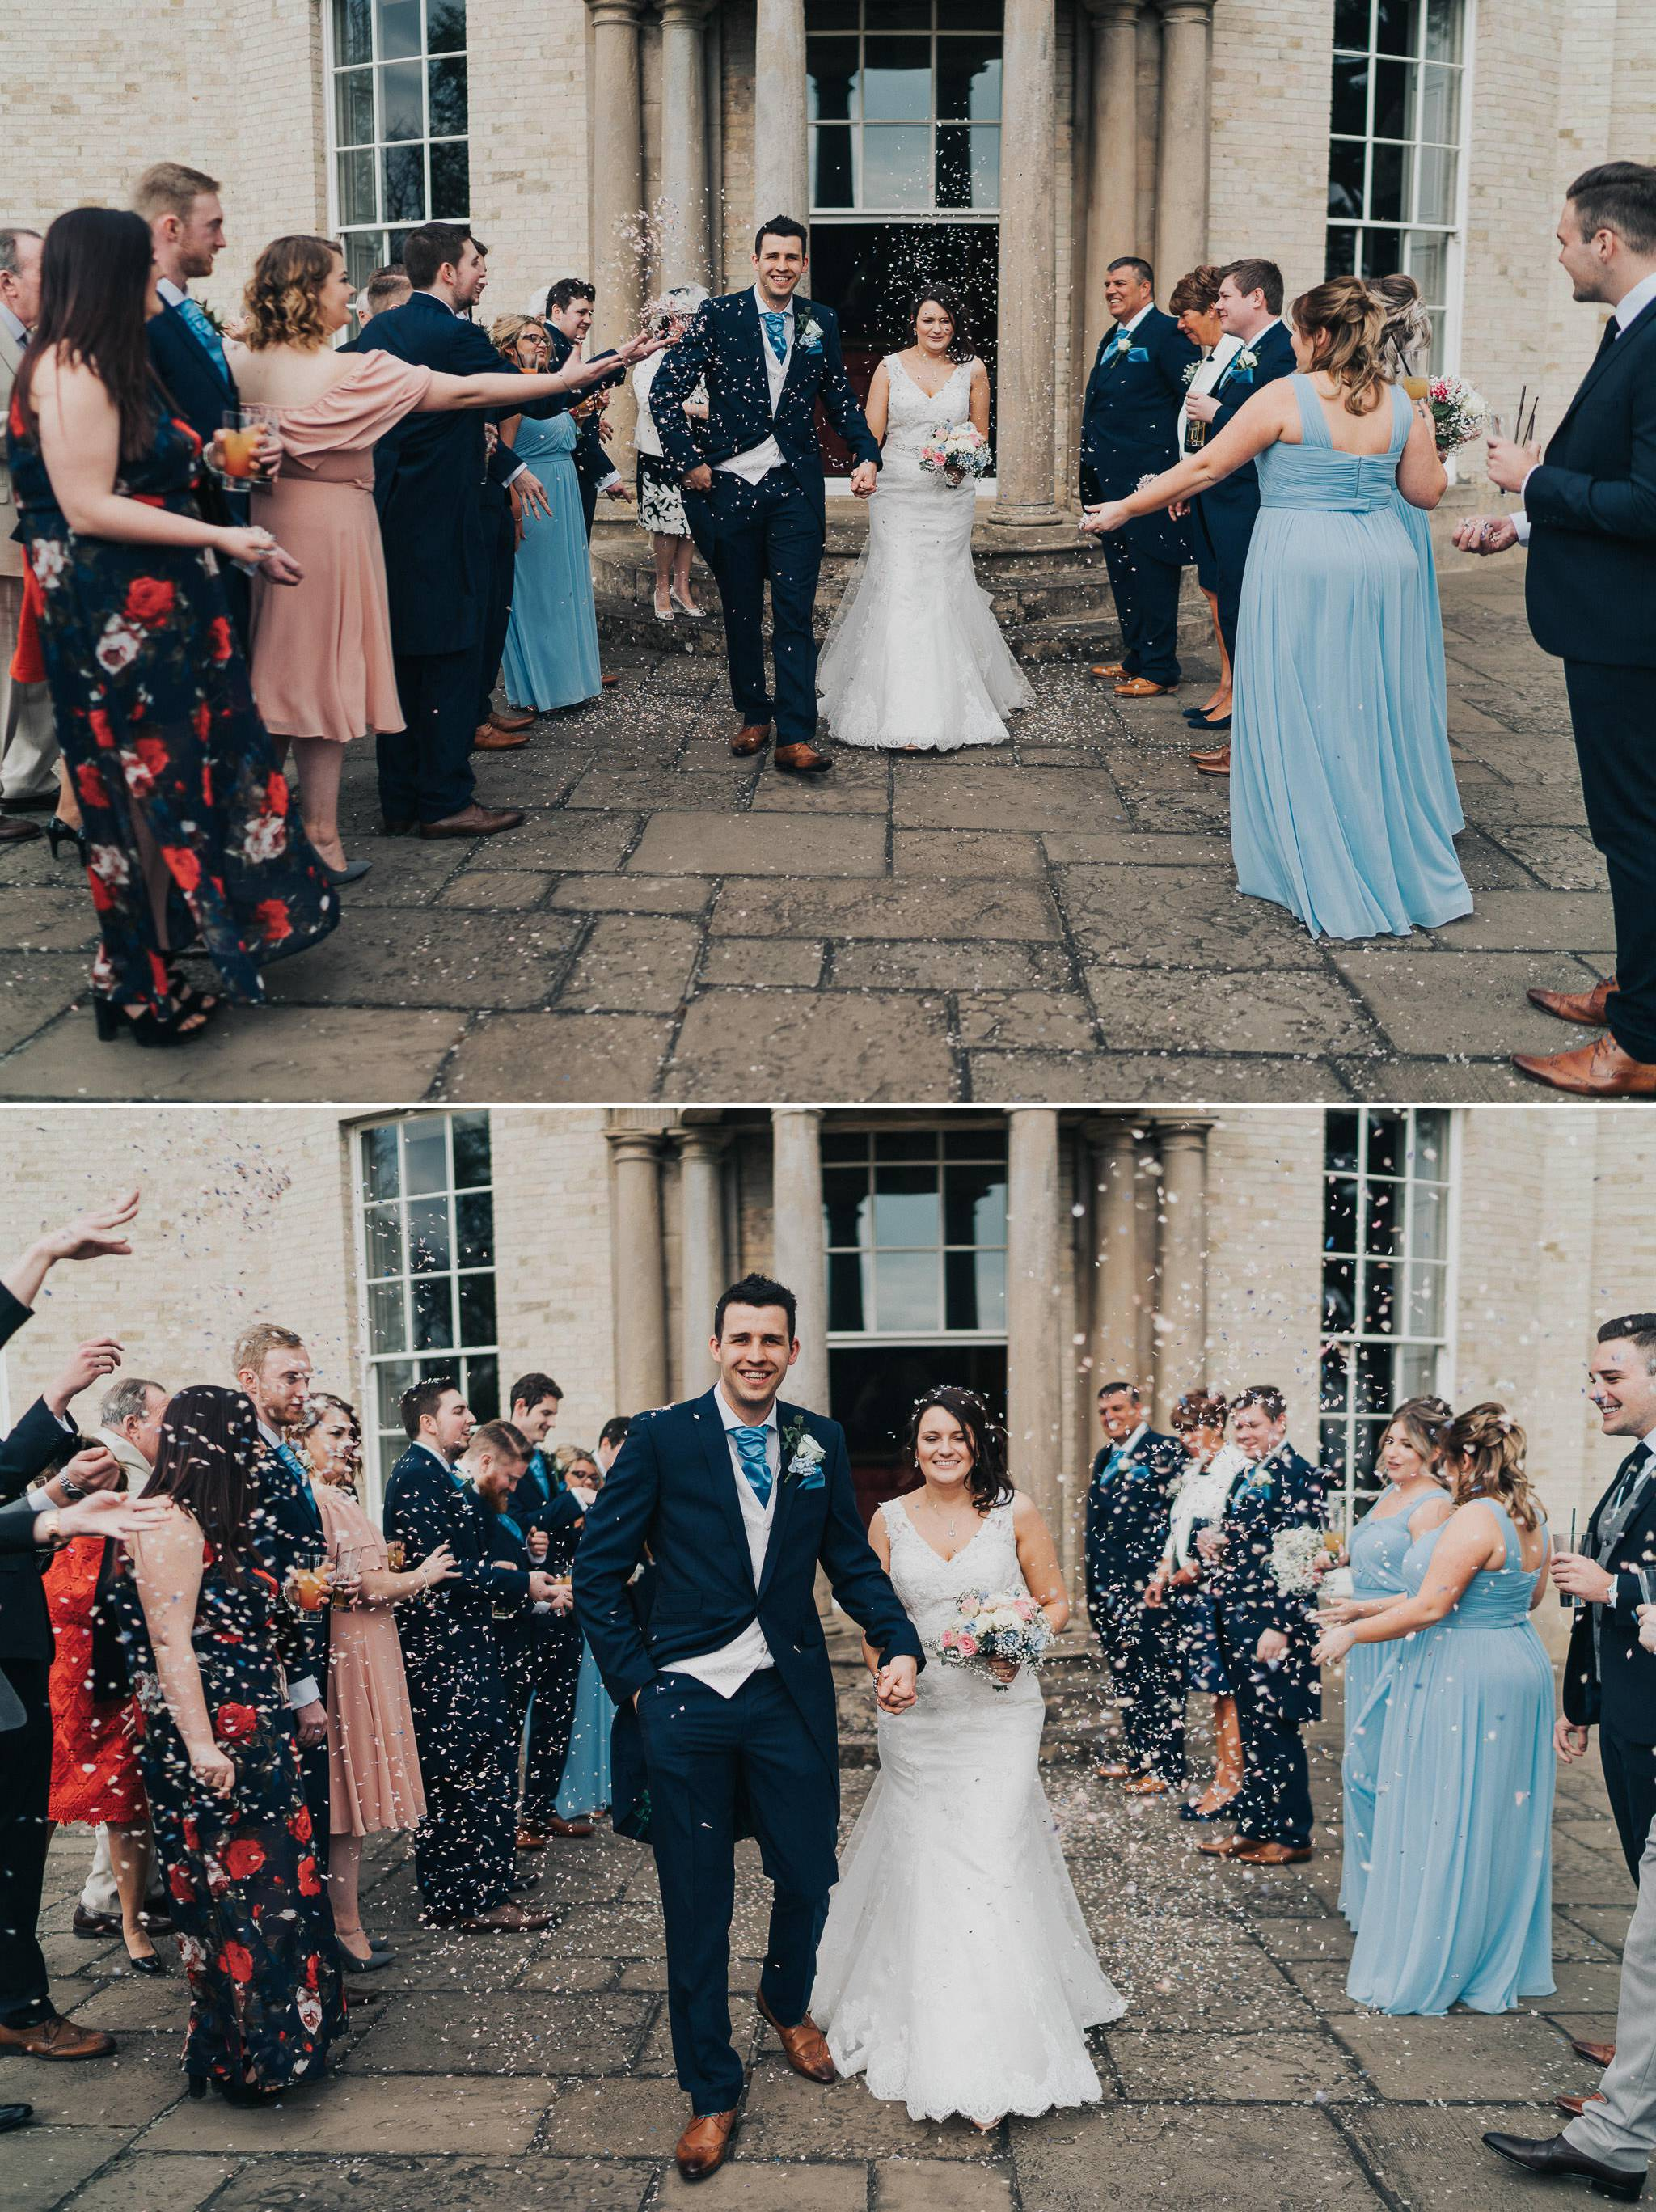 stubton-hall-wedding-photography 11.jpg